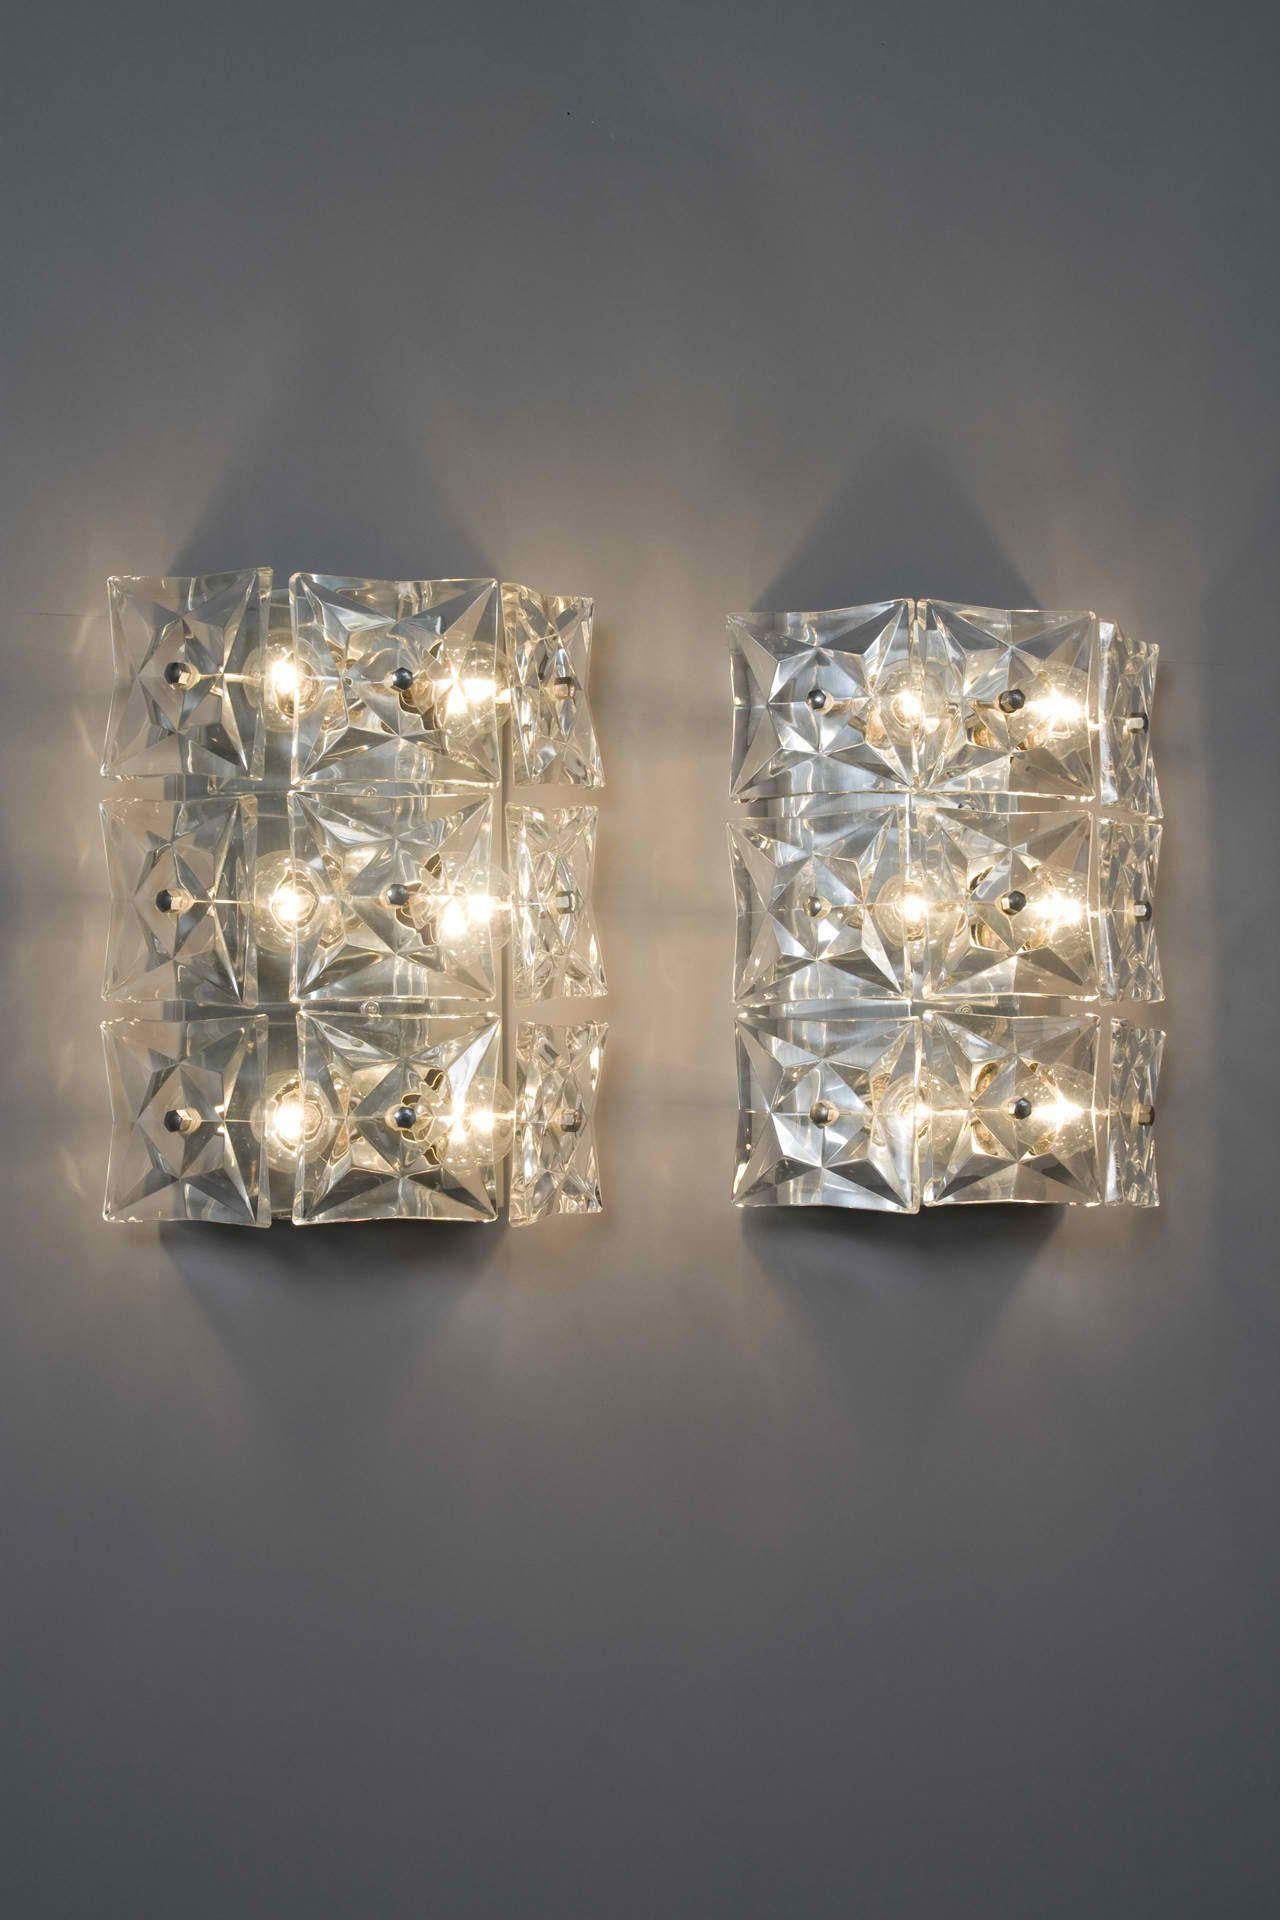 Crystal sconces | Crystal light fixture, Industrial ... on Crystal Bathroom Sconces id=17333